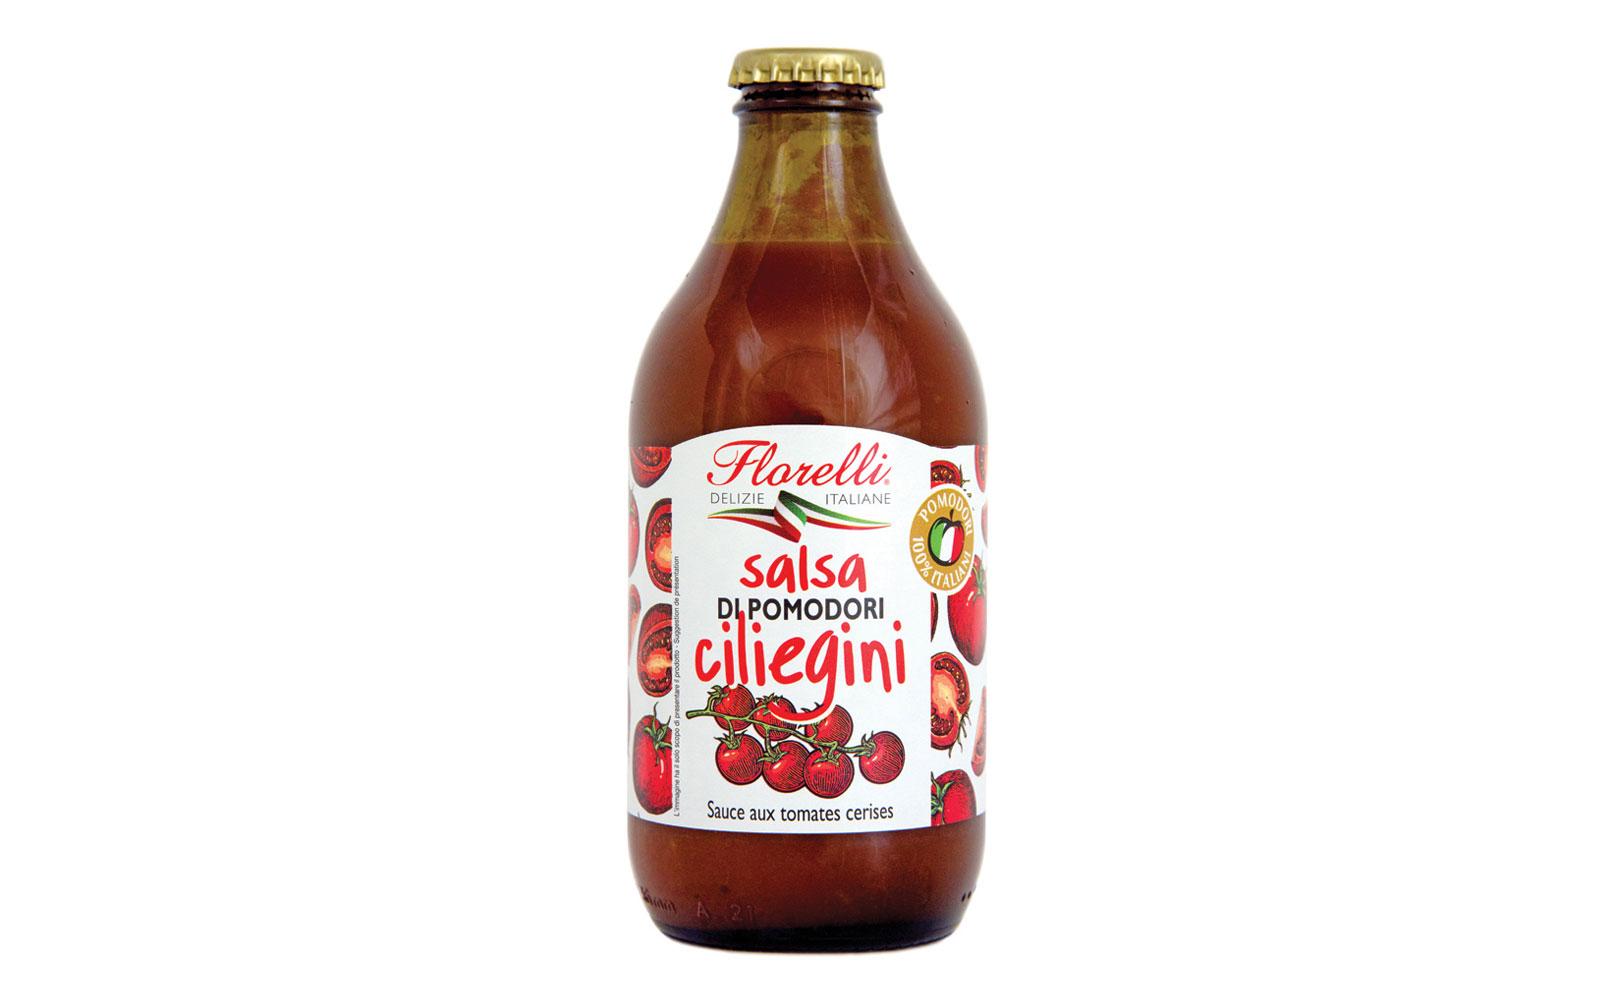 florelli sauce tomates cerises